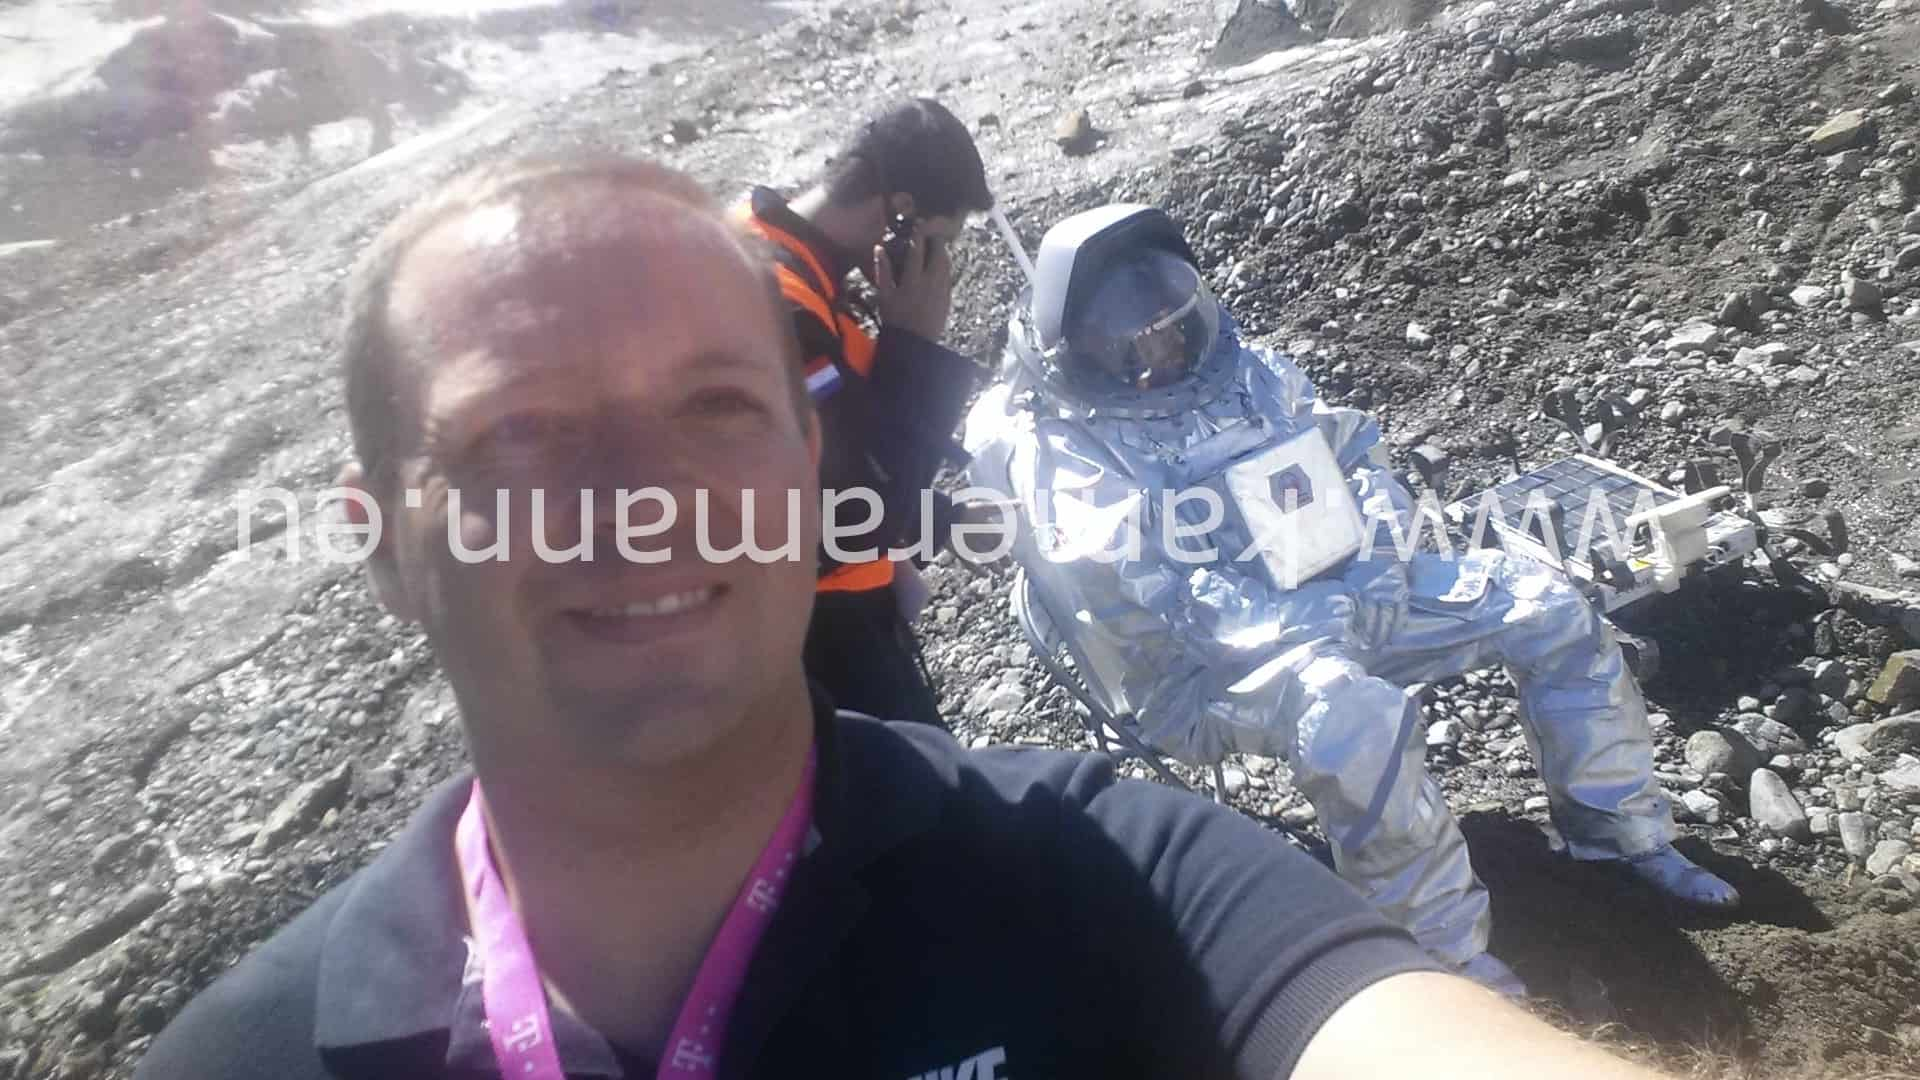 wpid 20150803 124230 e1438635137879 - ORF - Mars Simulation